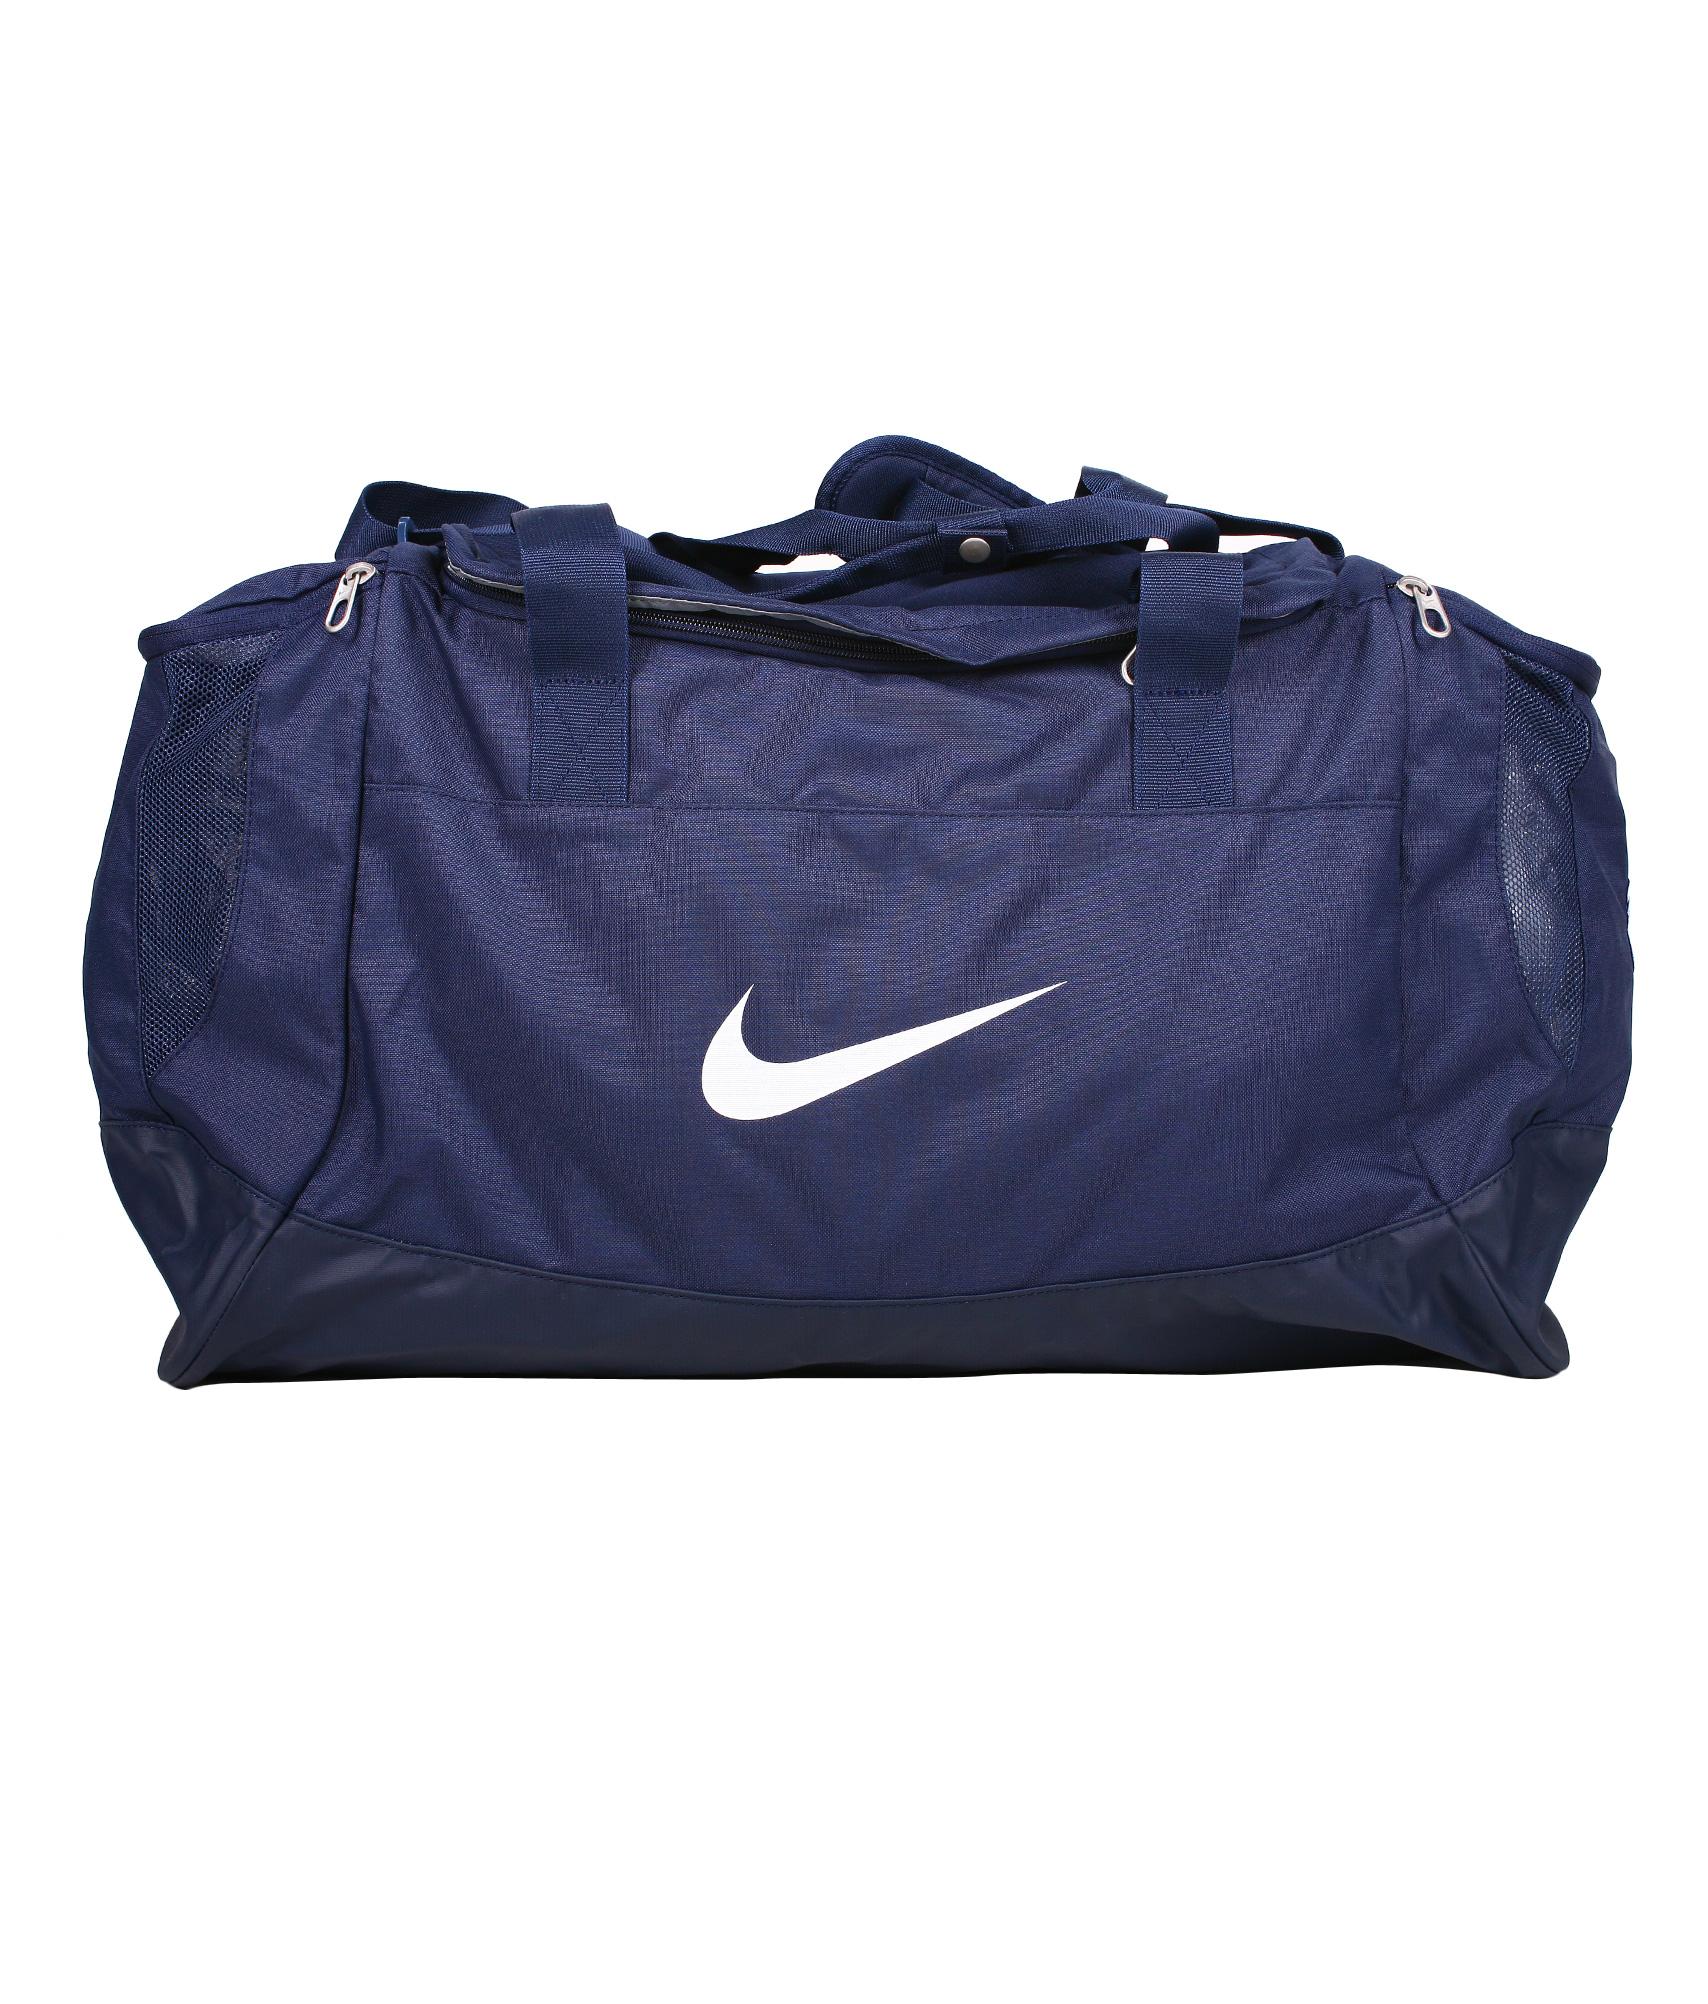 Сумка малая Nike, Цвет-Синий, Размер-L спортивные лифчики найк